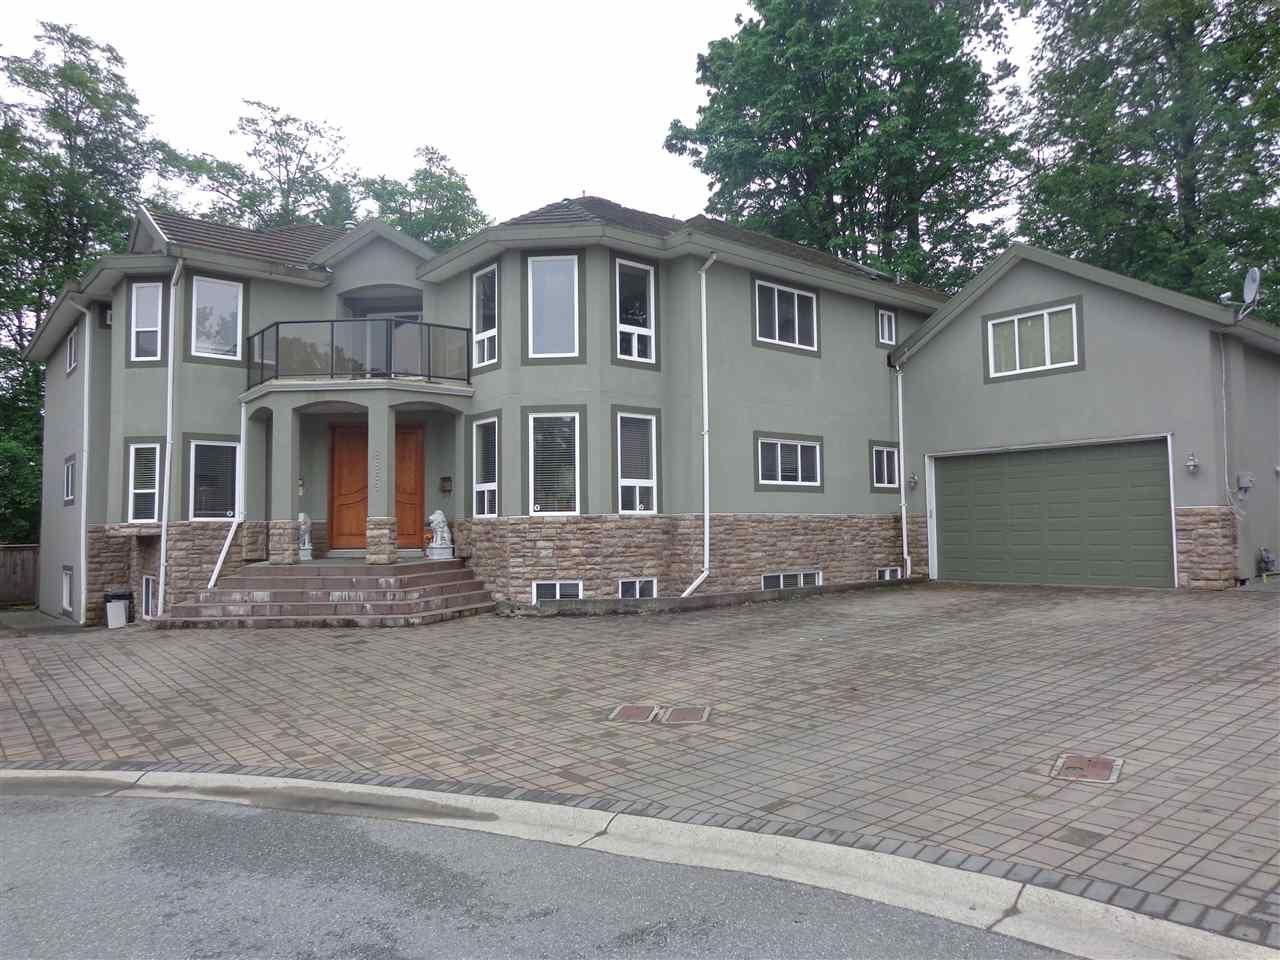 Main Photo: 8869 EDINBURGH Drive in Surrey: Queen Mary Park Surrey House for sale : MLS®# R2370968